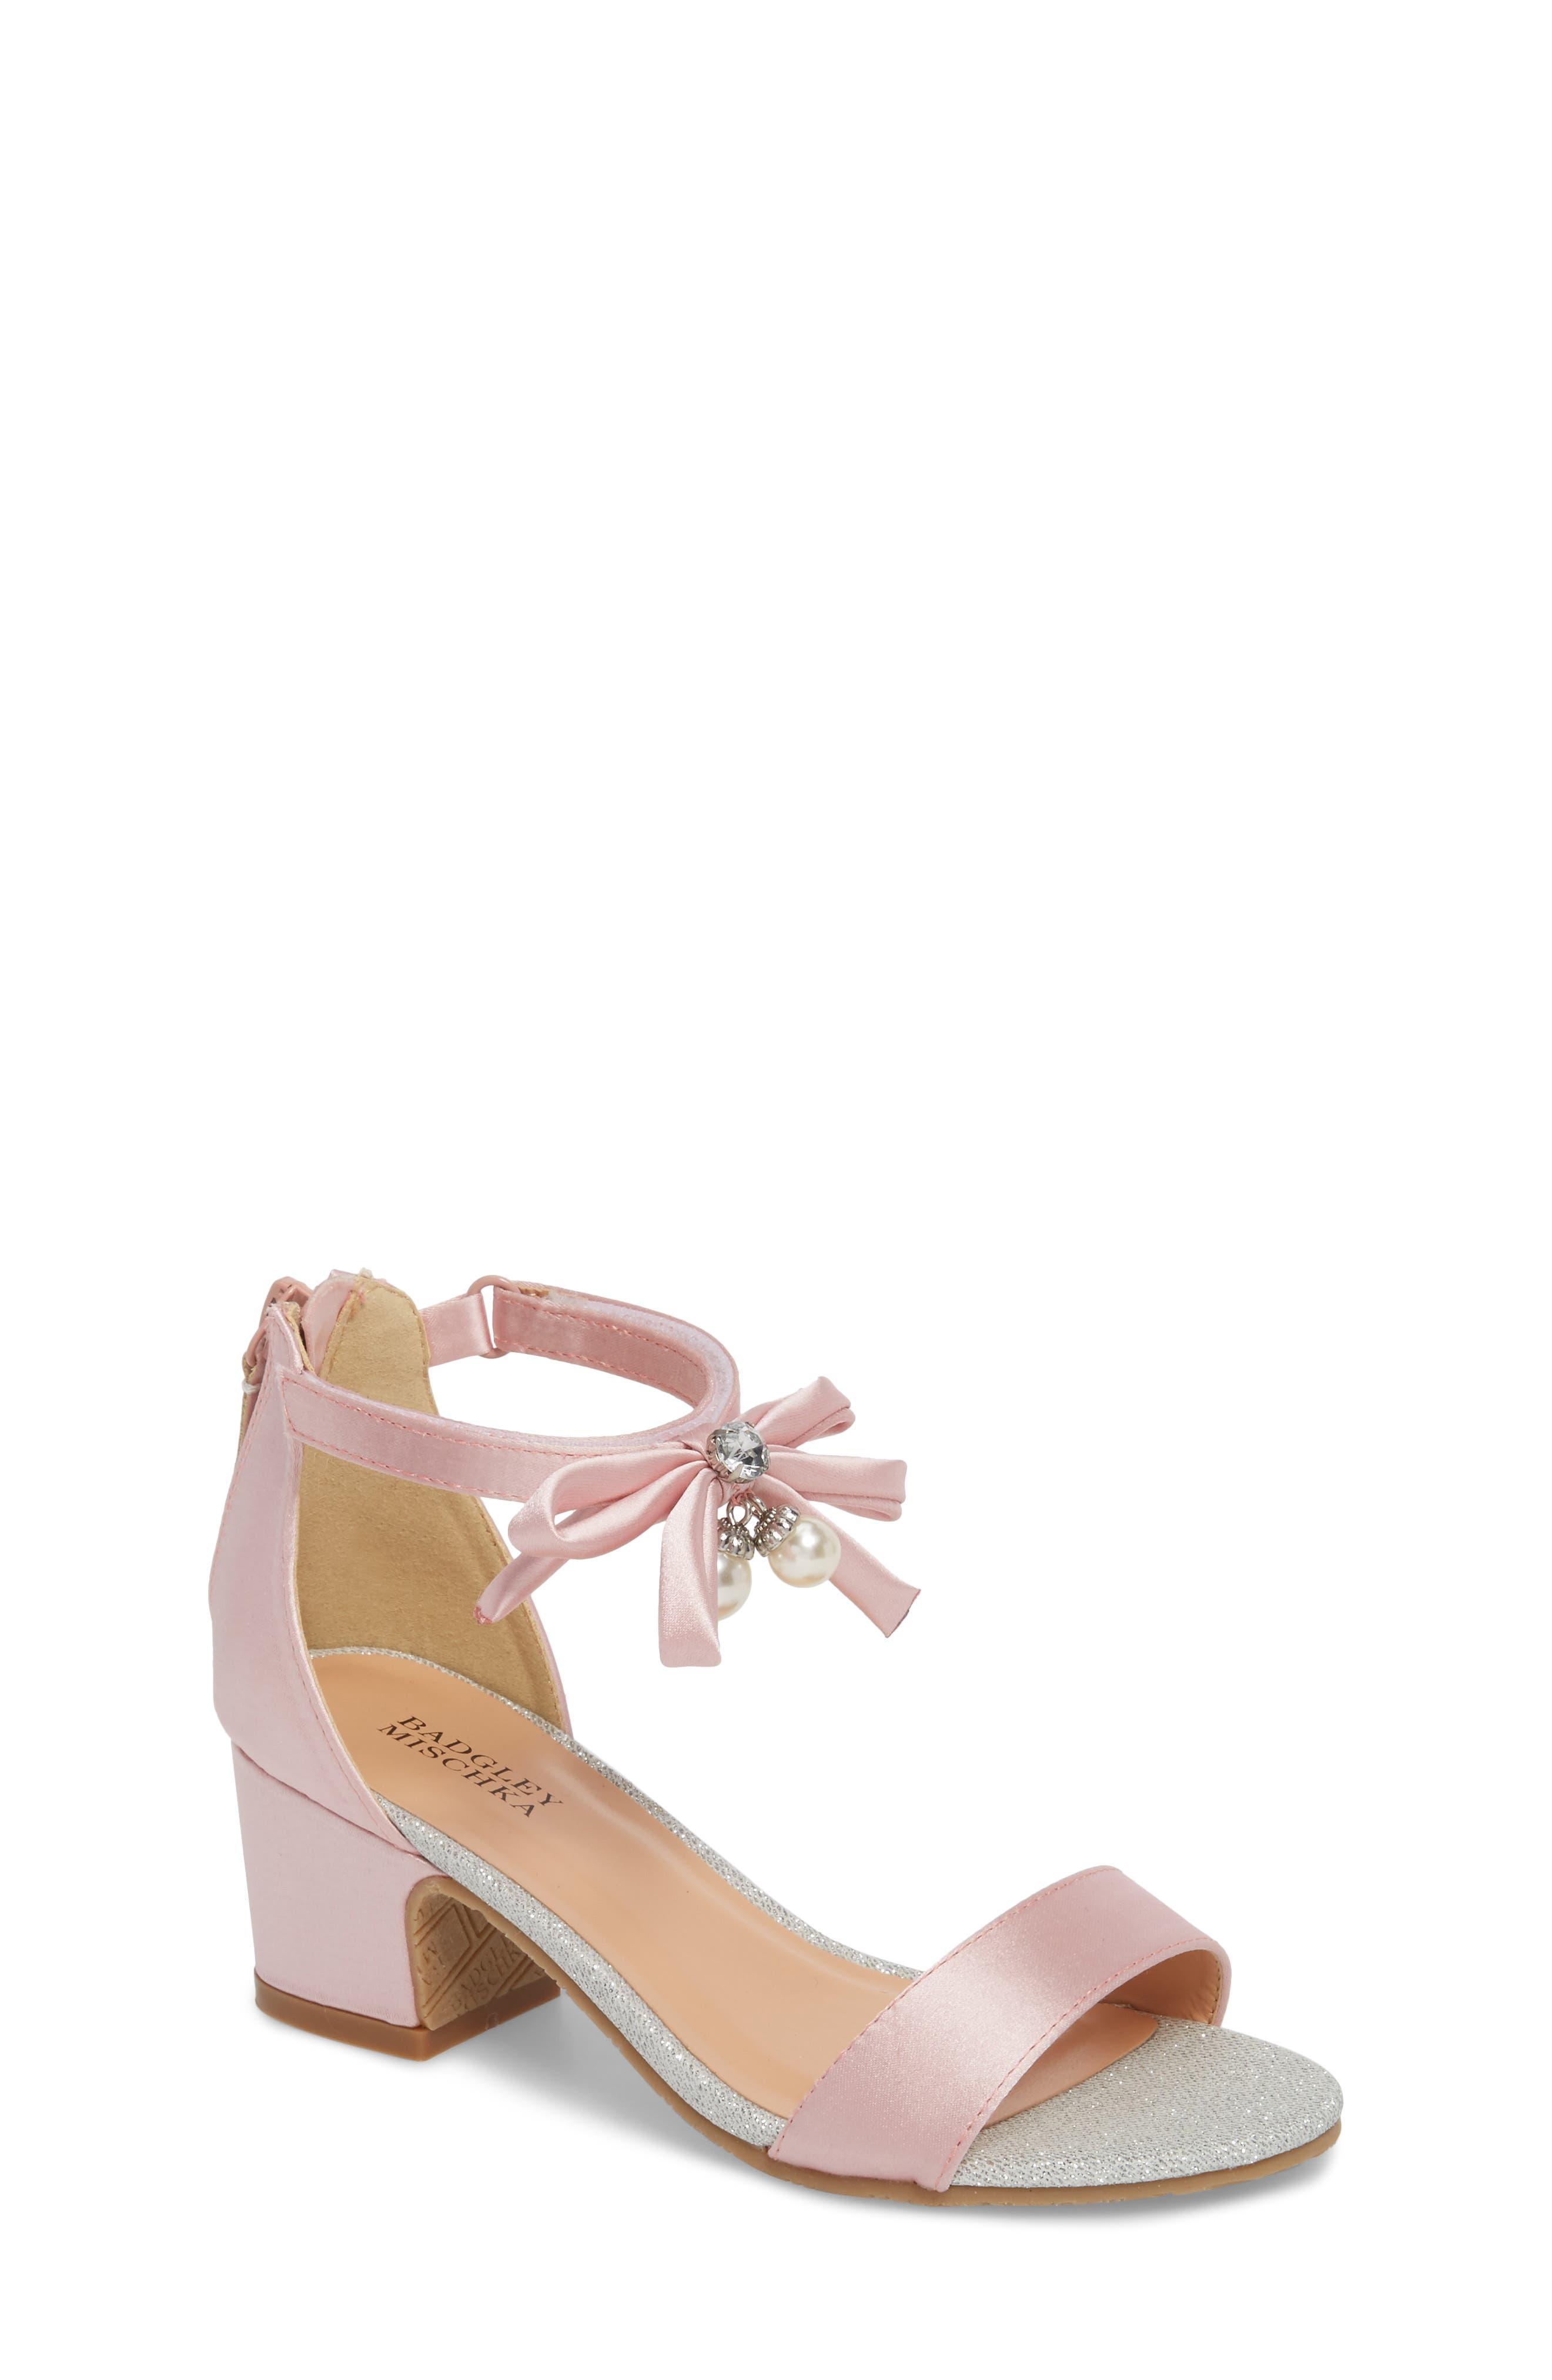 Pernia Embellished Sandal,                         Main,                         color, PINK/ SILVER